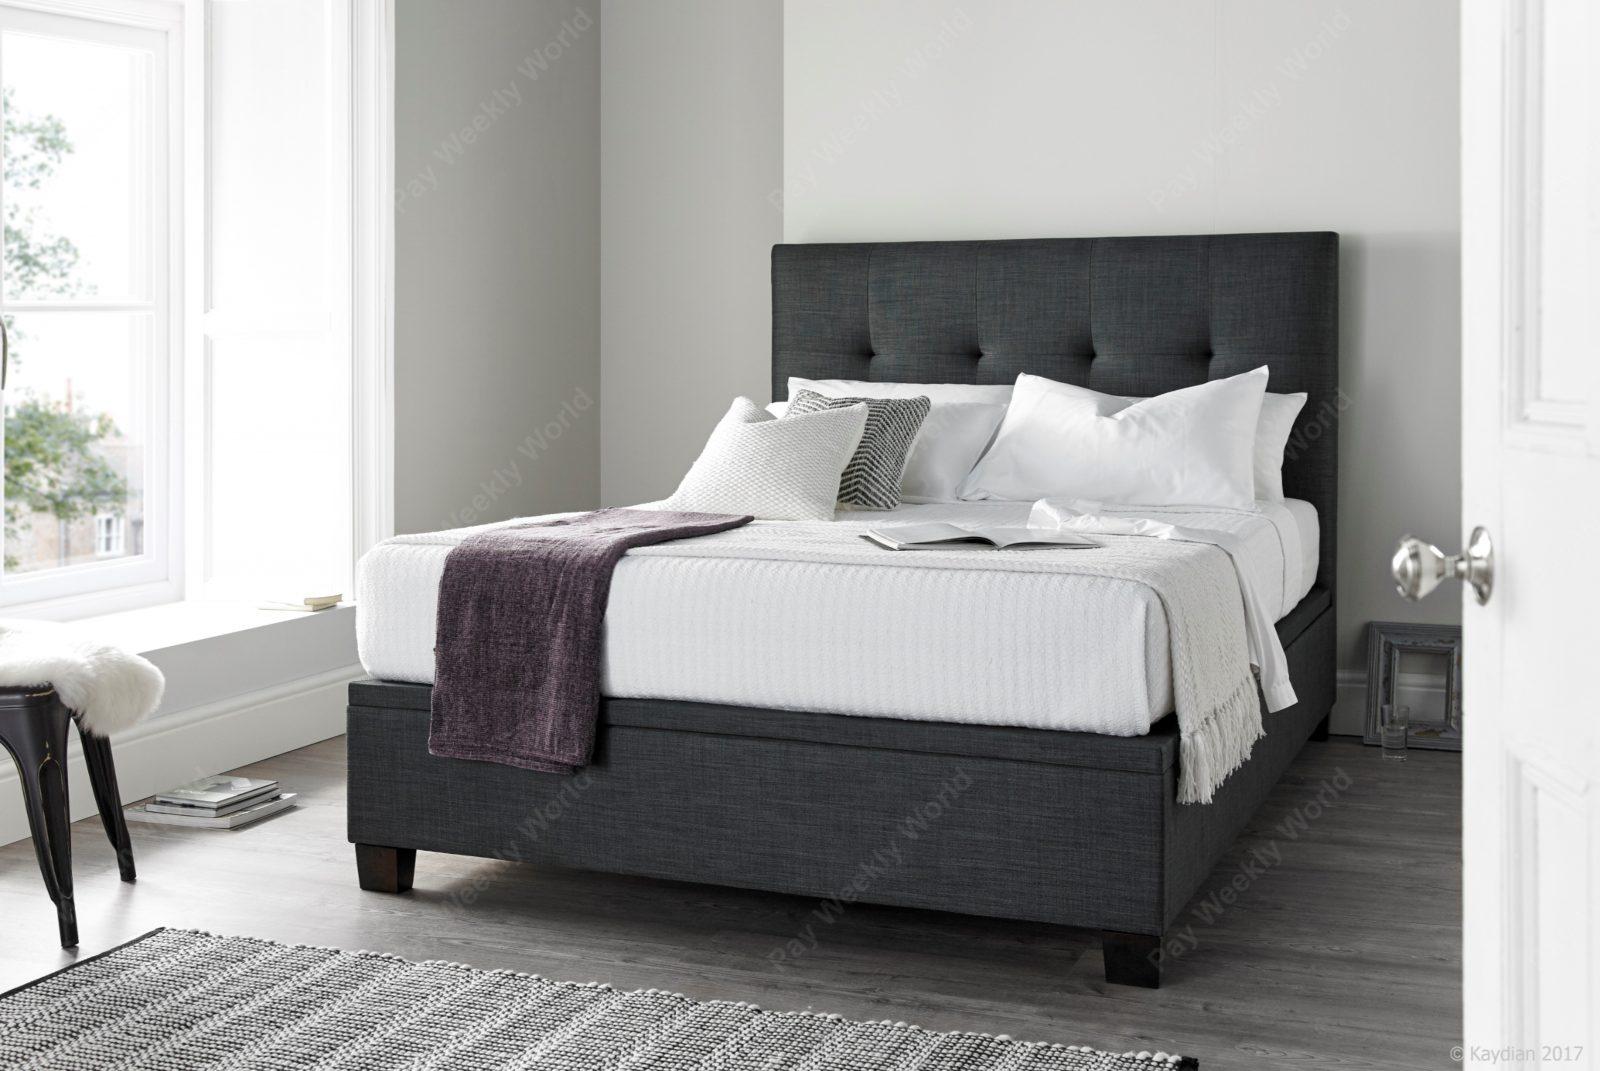 Walkworth Ottoman Slate Bed Frame – Double